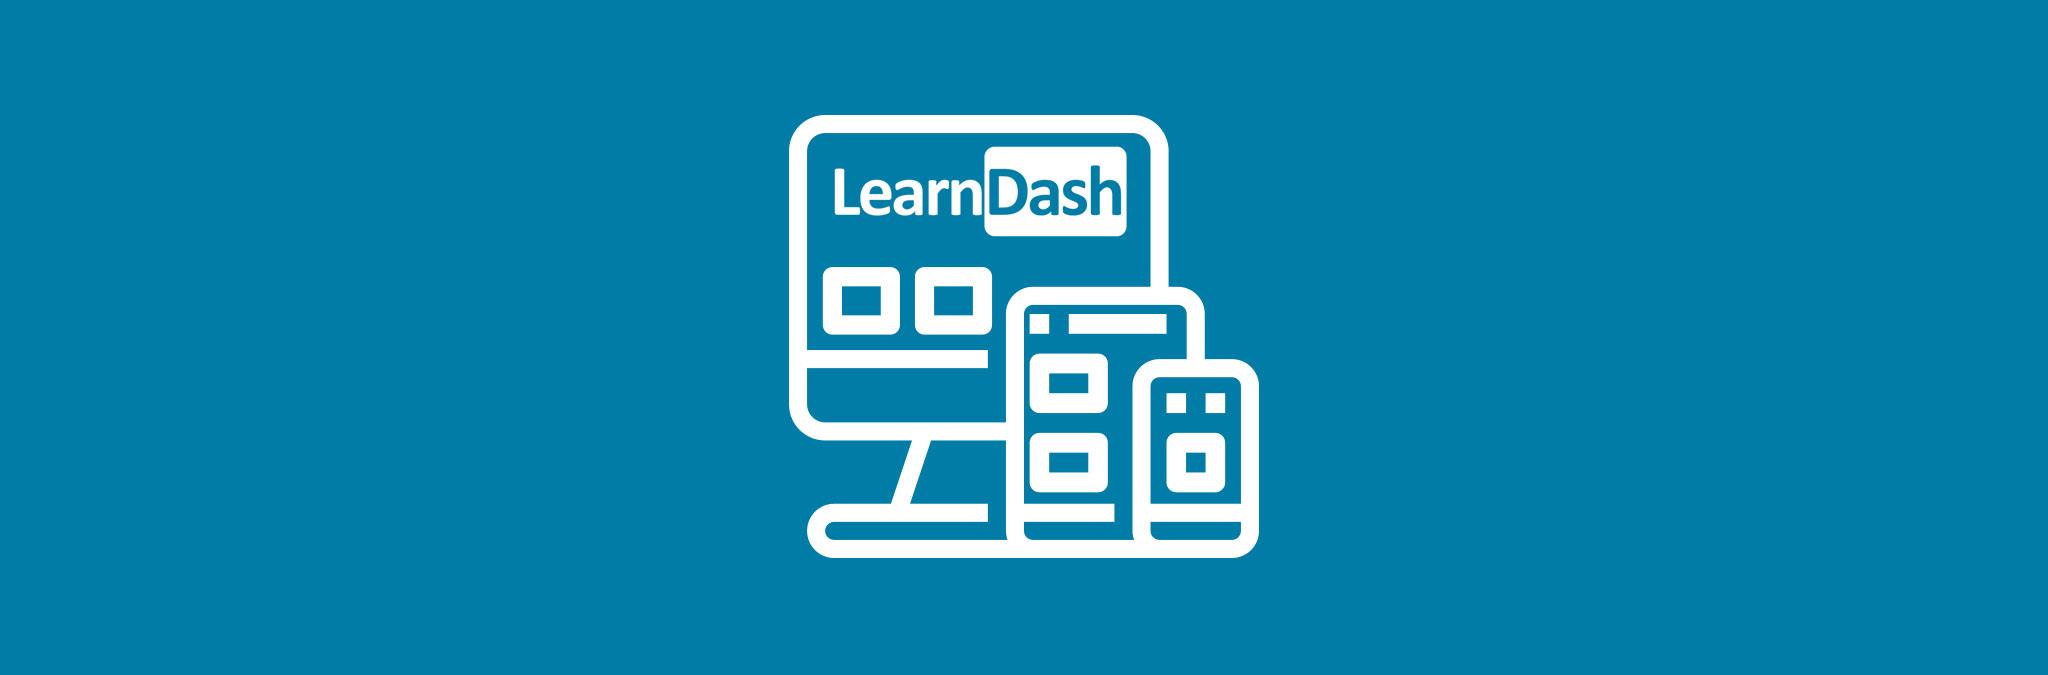 WordPress Adaptive Learning With LearnDash Plugin Banner Image